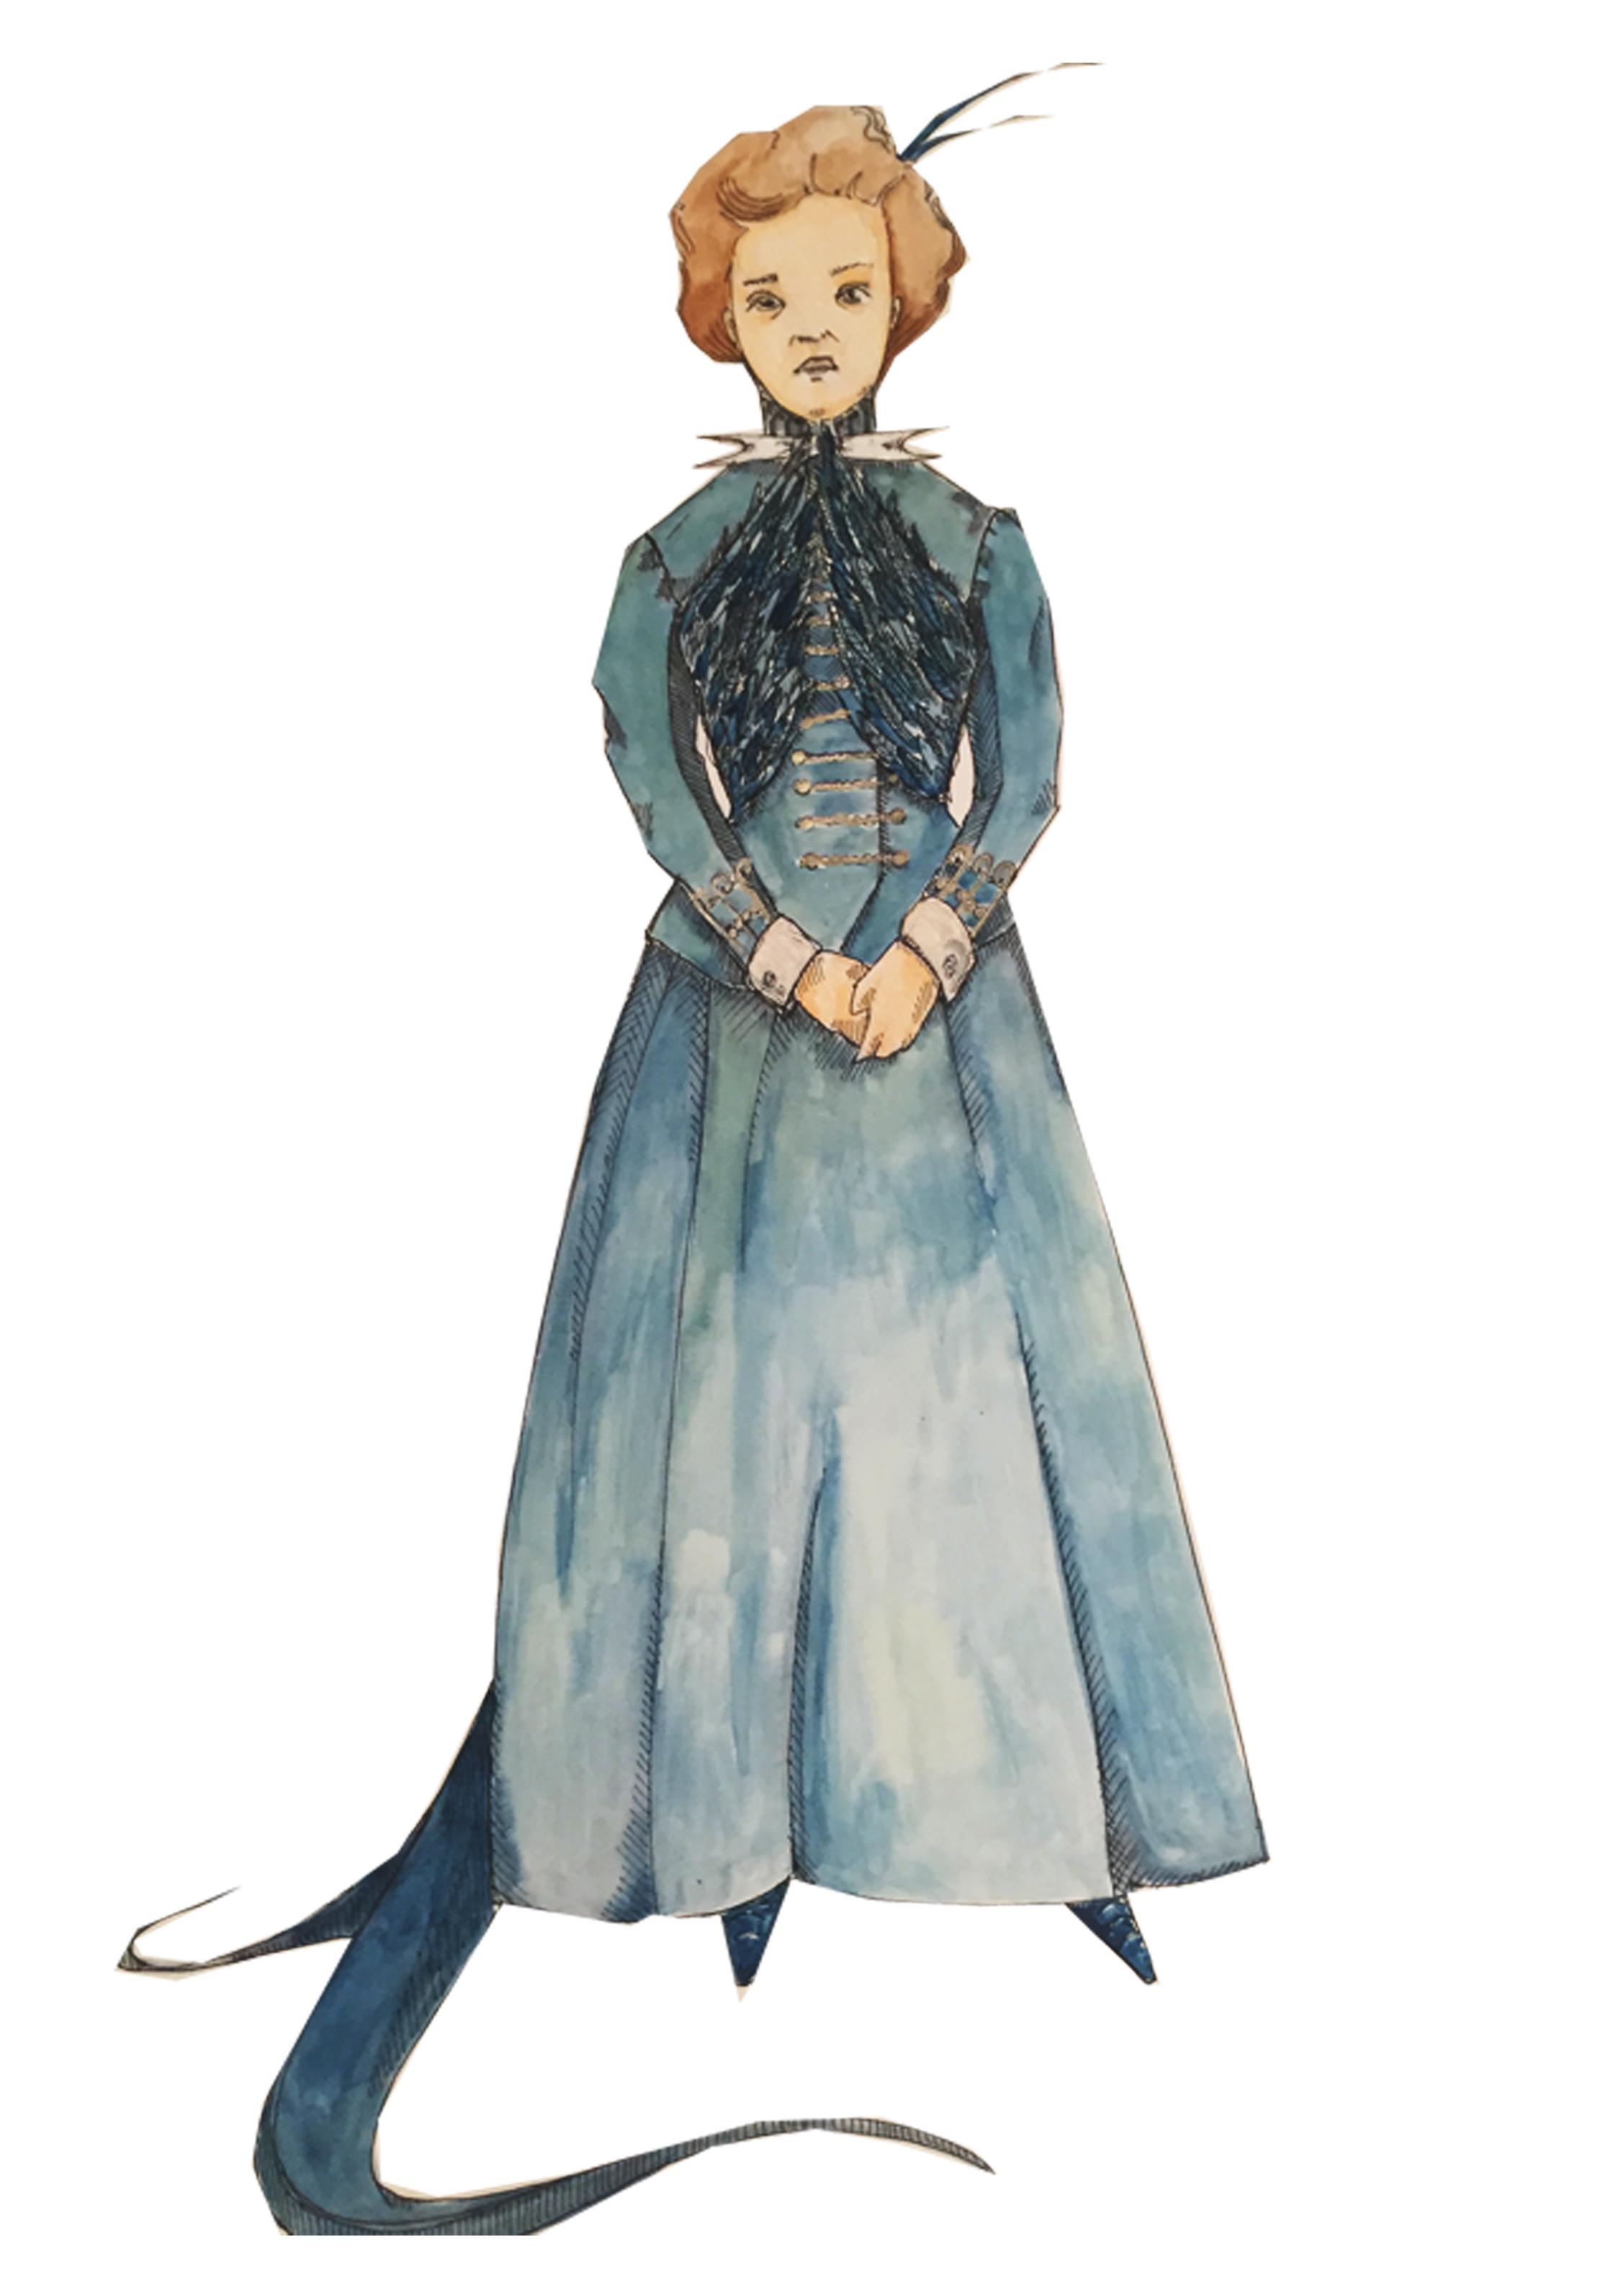 Countess Geschwitz Act II